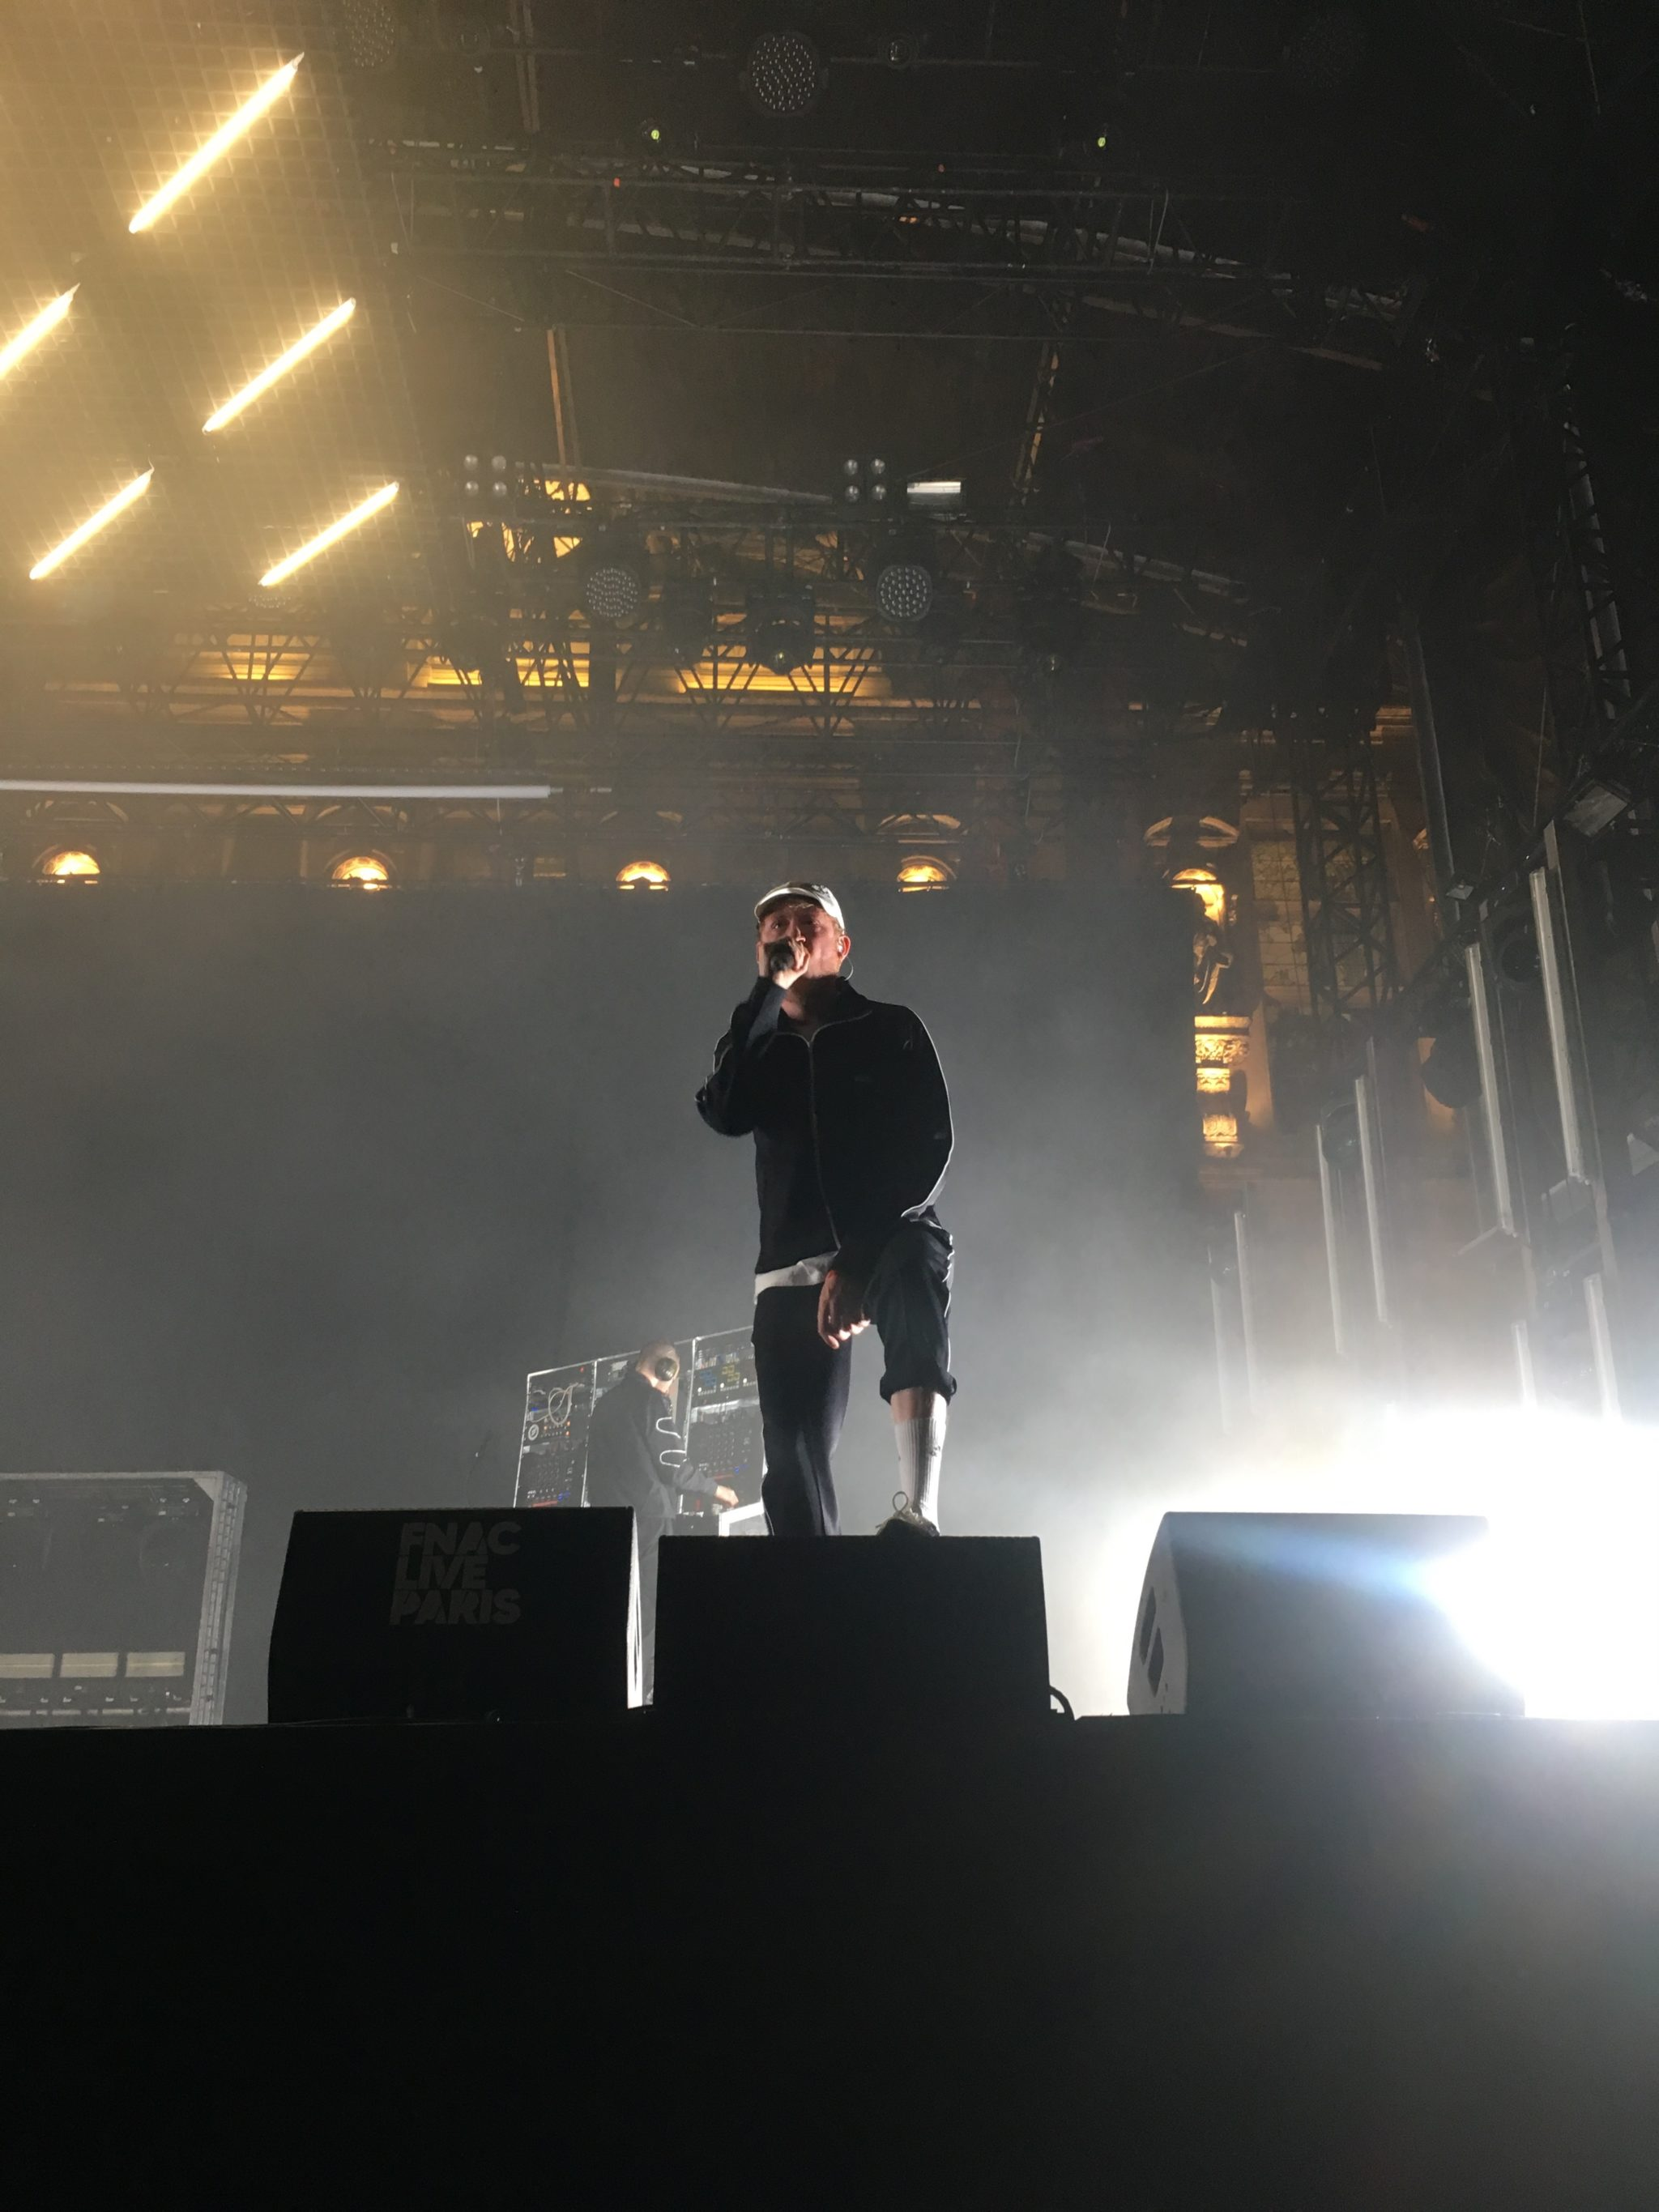 Eddy de Pretto Fnac Live 2019 photo image